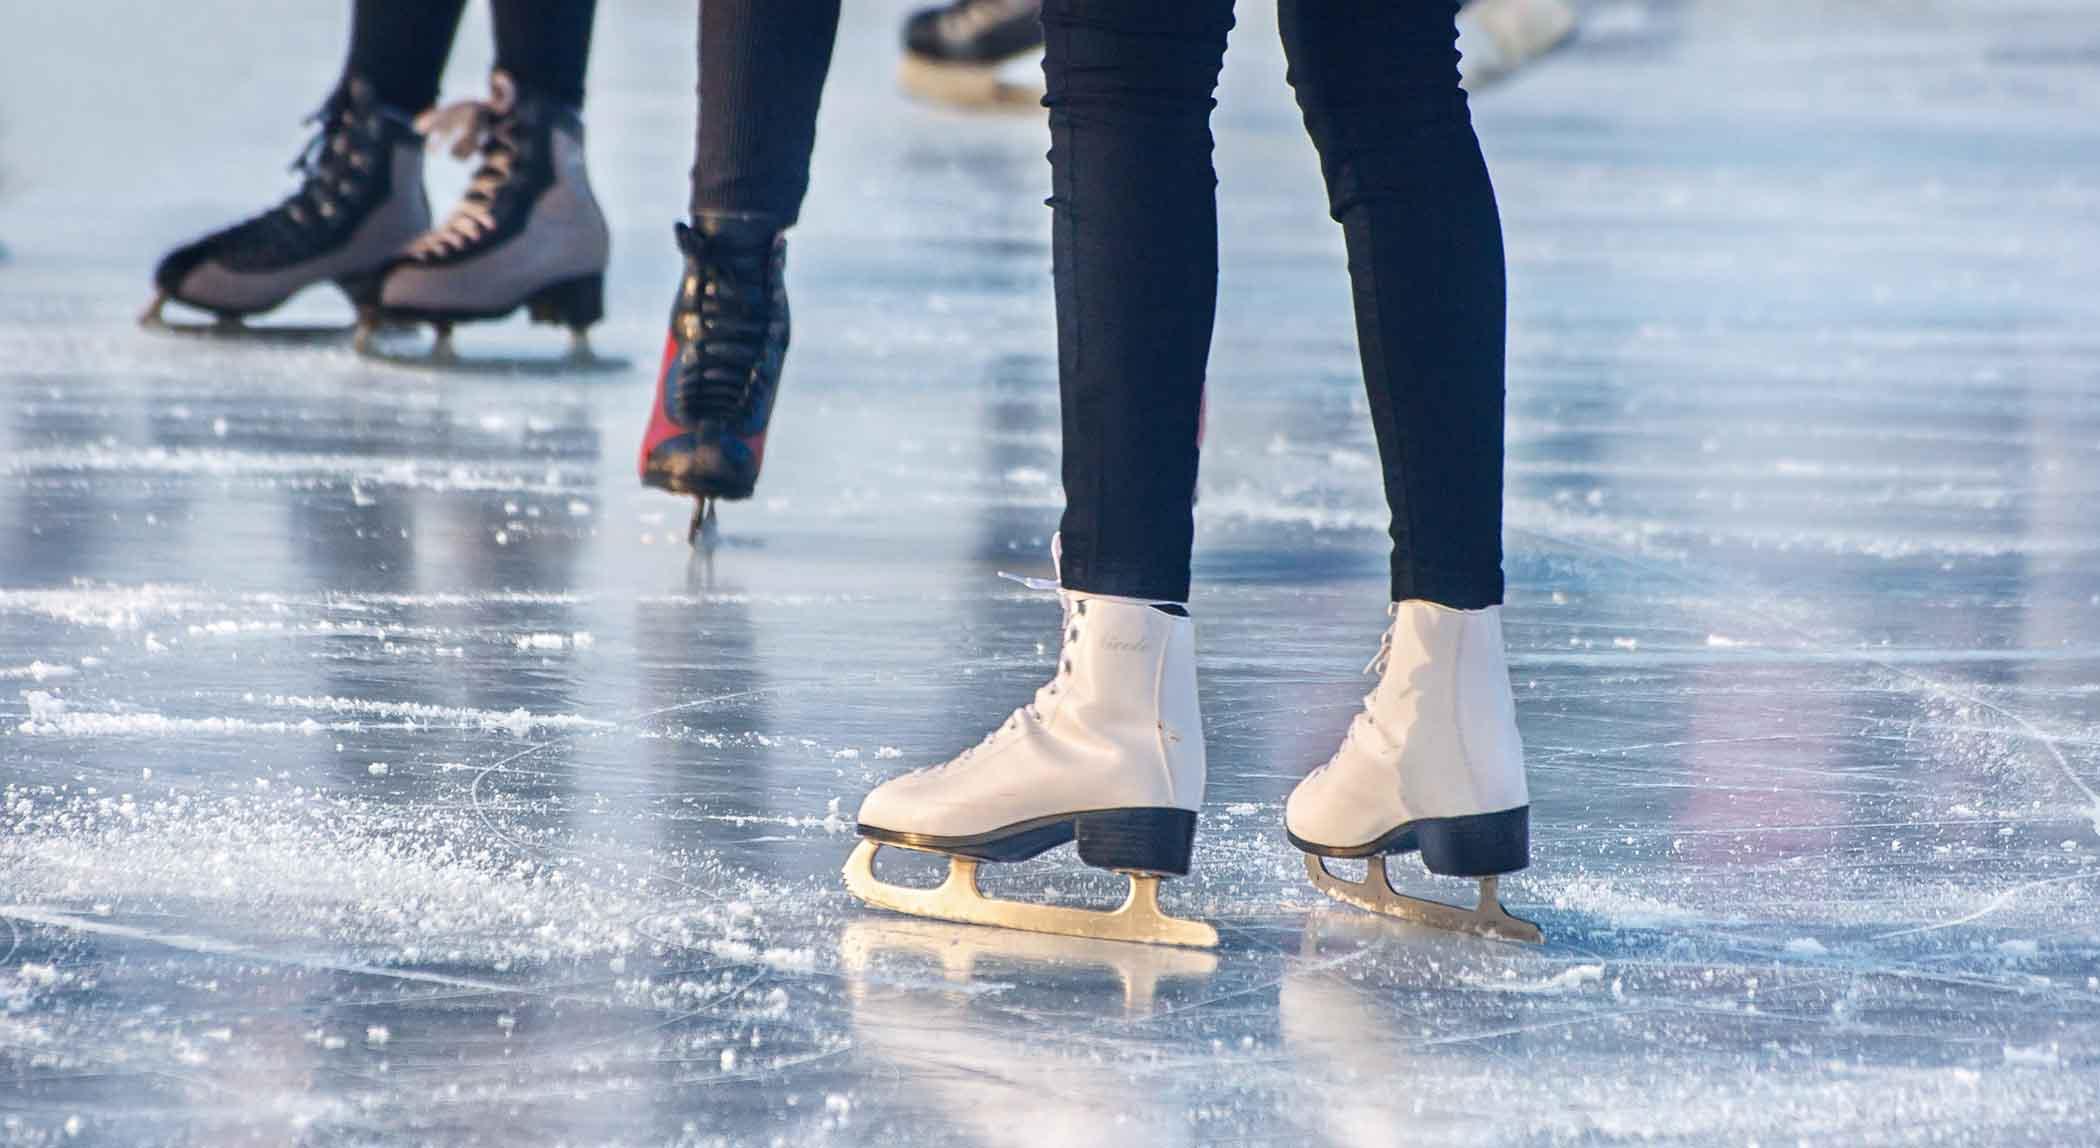 People at an ice skating rink